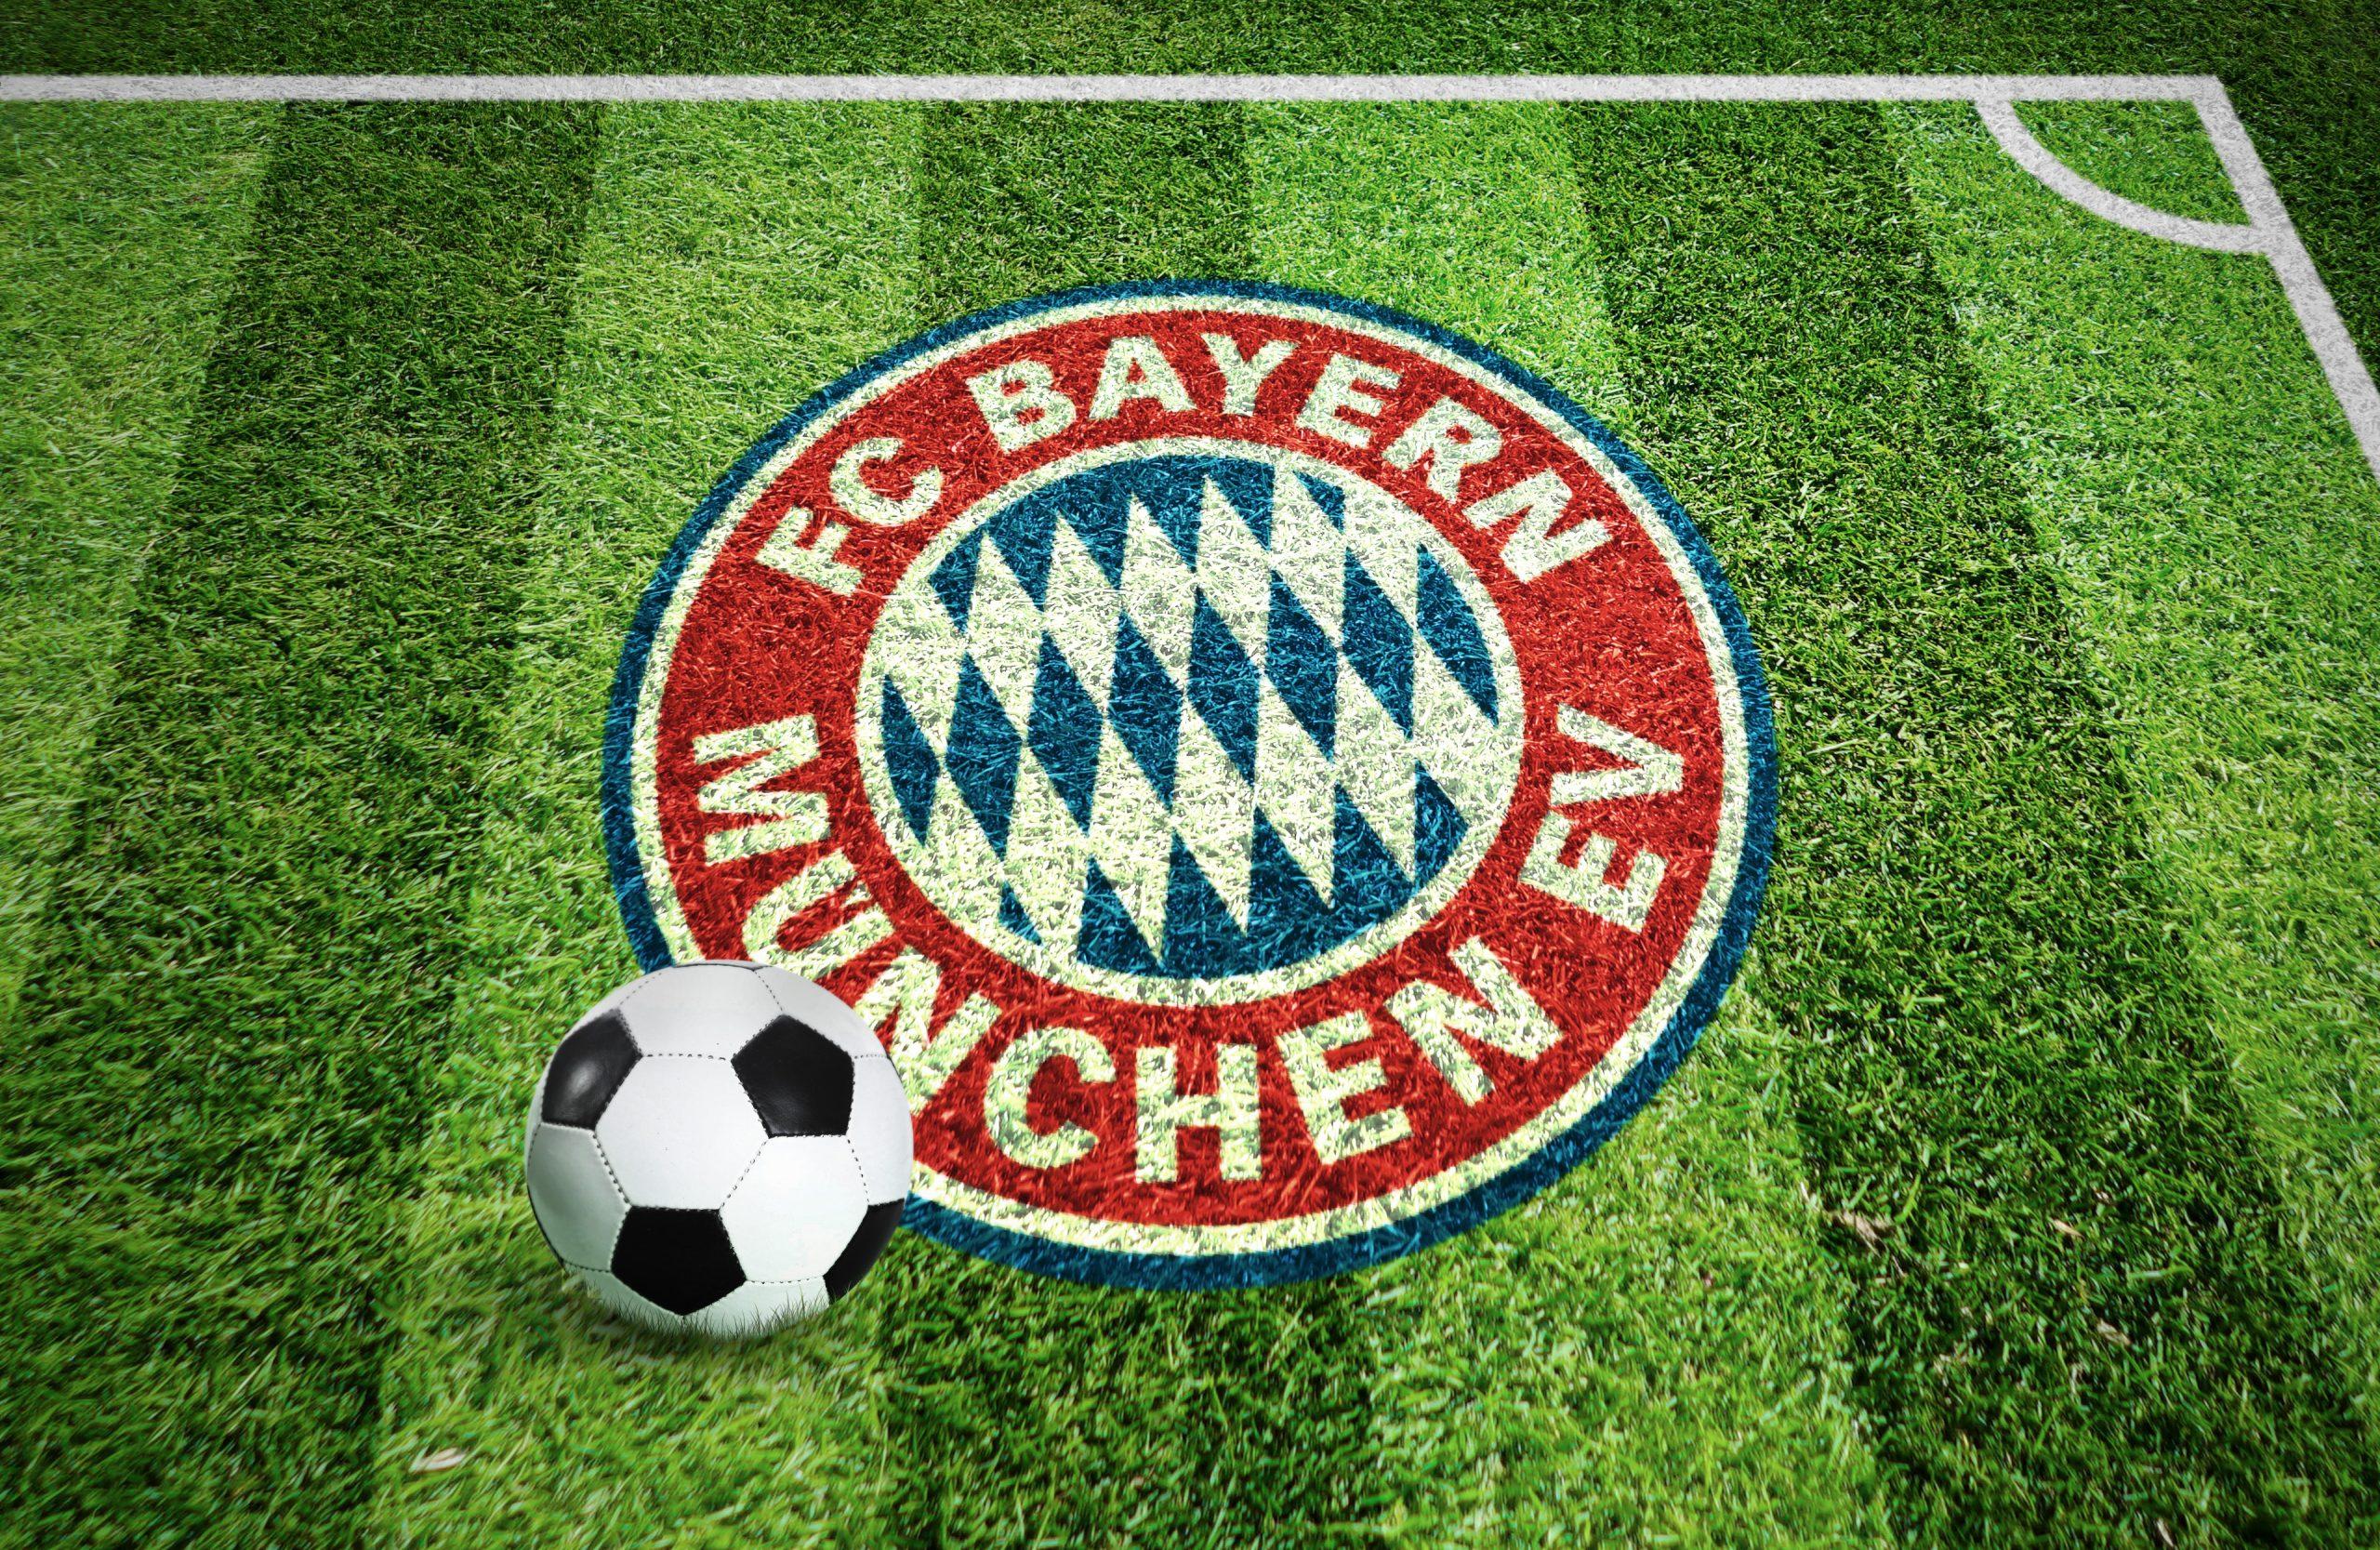 FC Bayern Stadium Grass Ground Logo Mockup